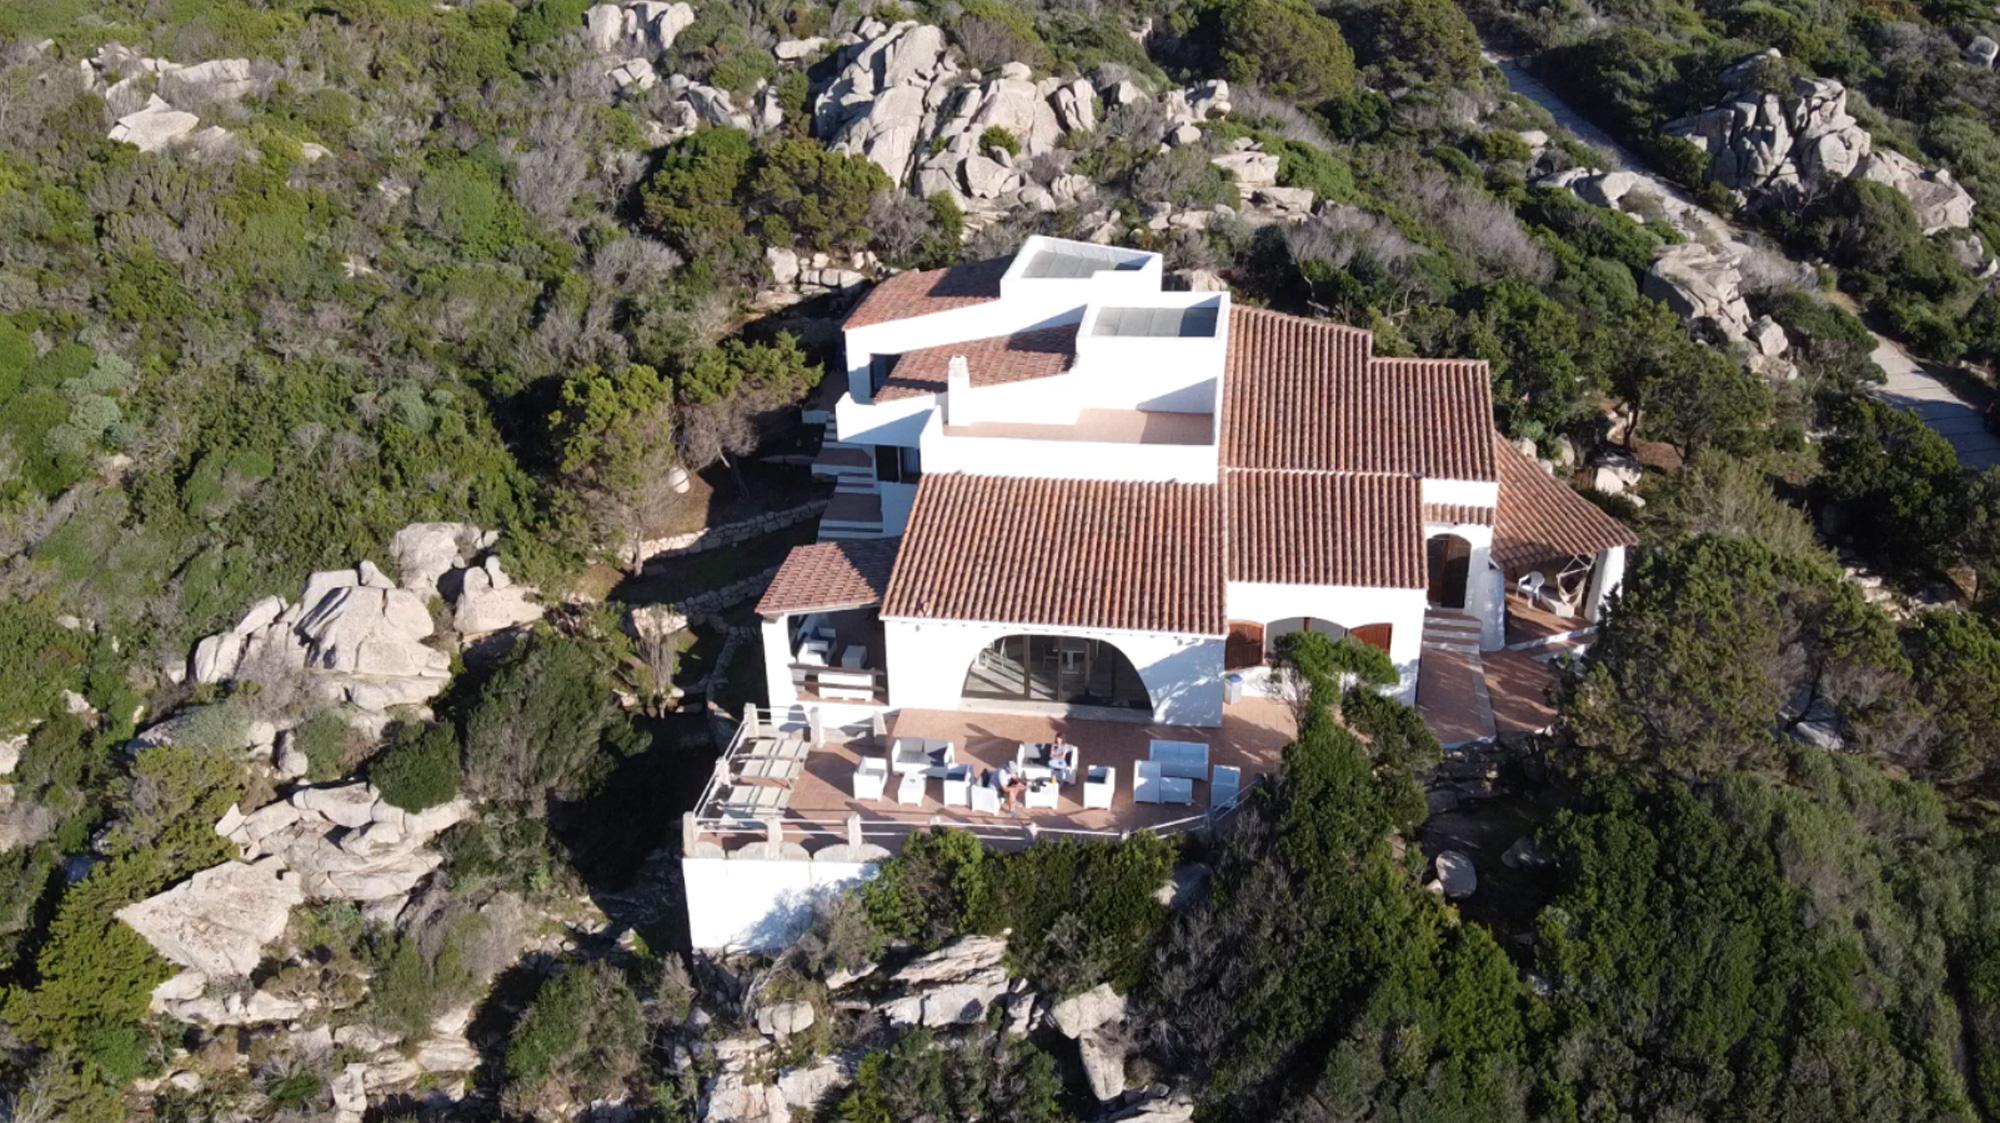 Prachtvoll: Unsere Villa Elena bei Santa Teresa Gallura